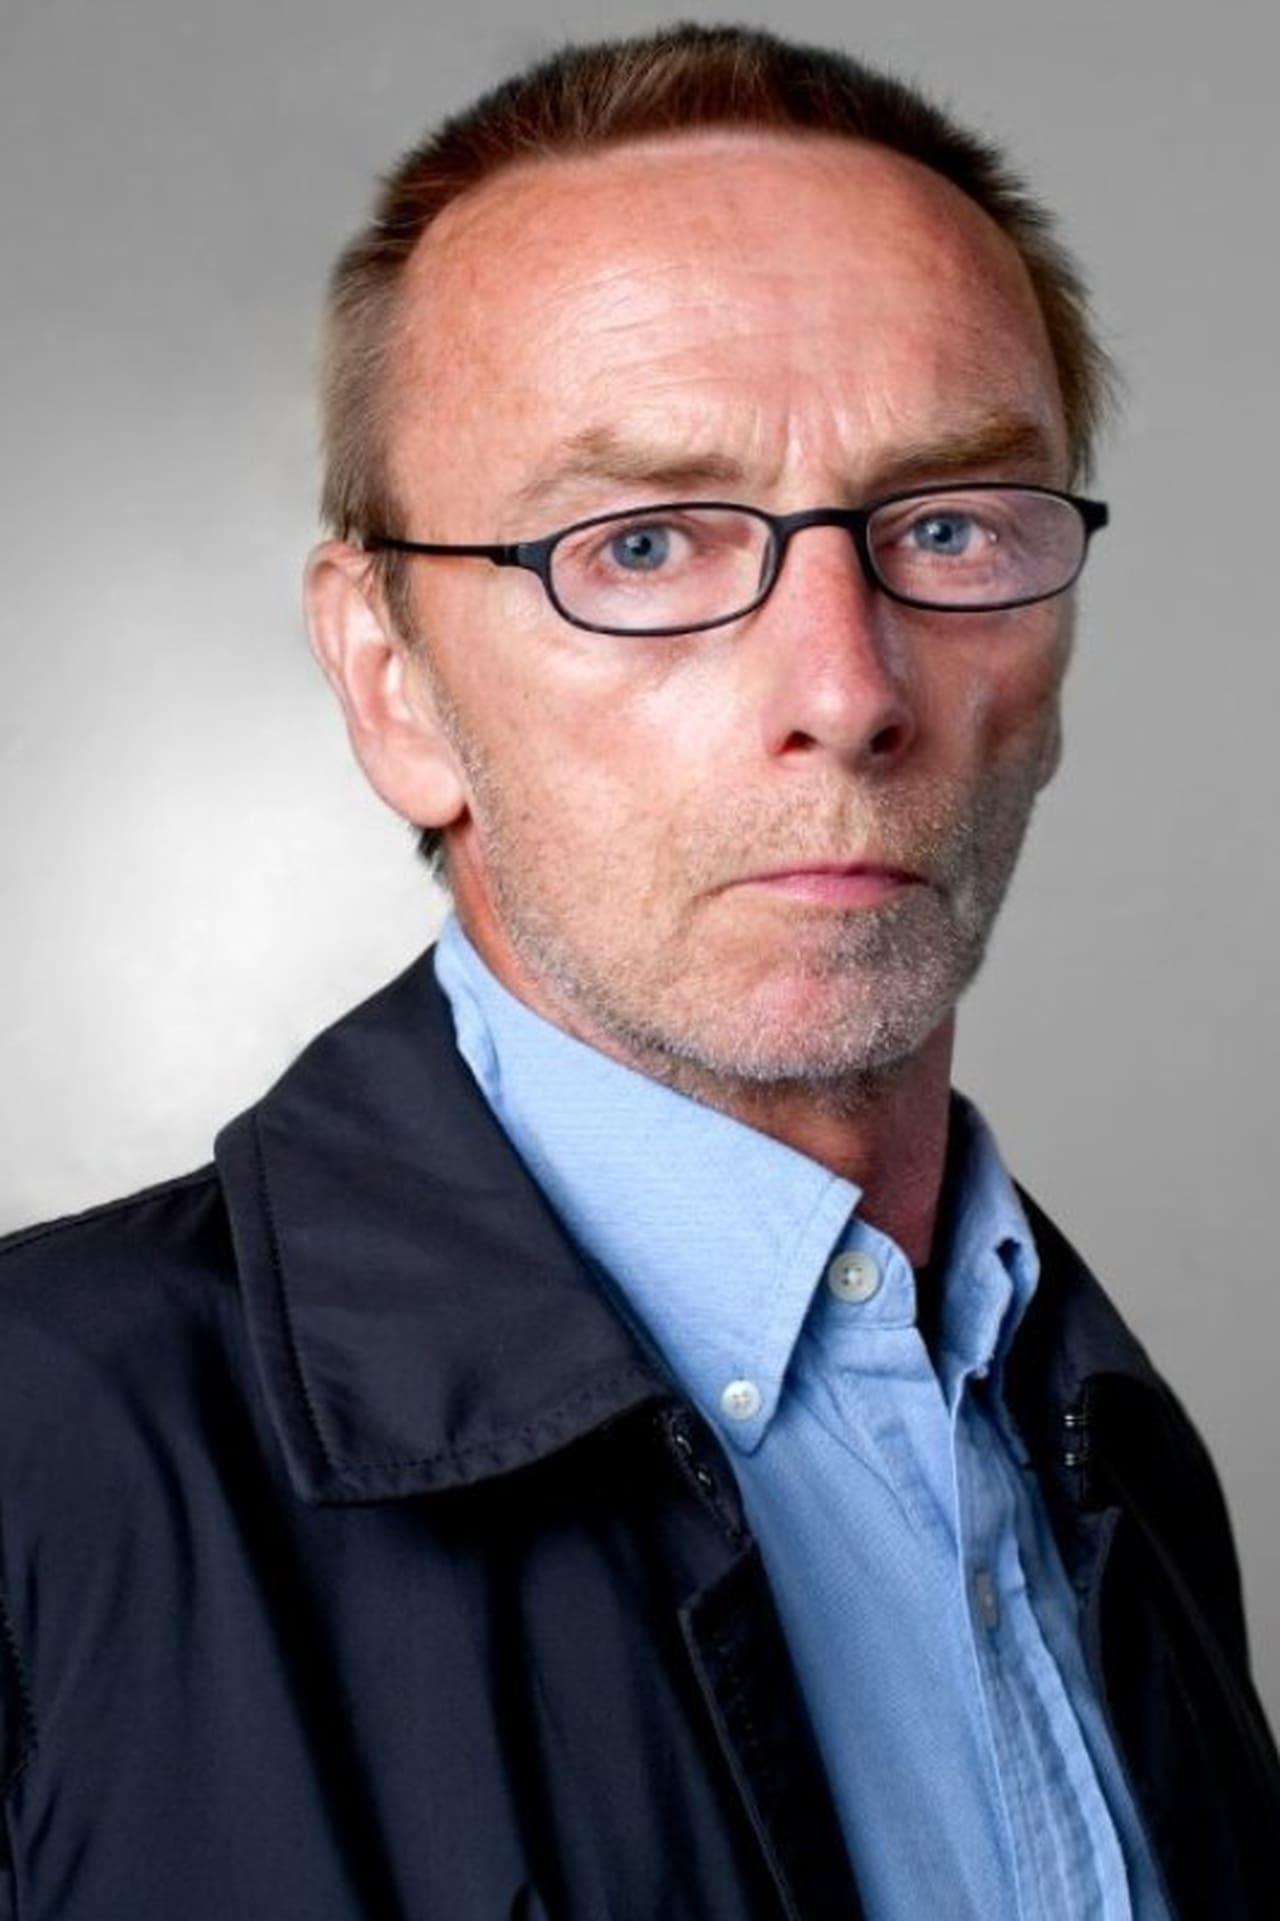 Mick O'Rourke